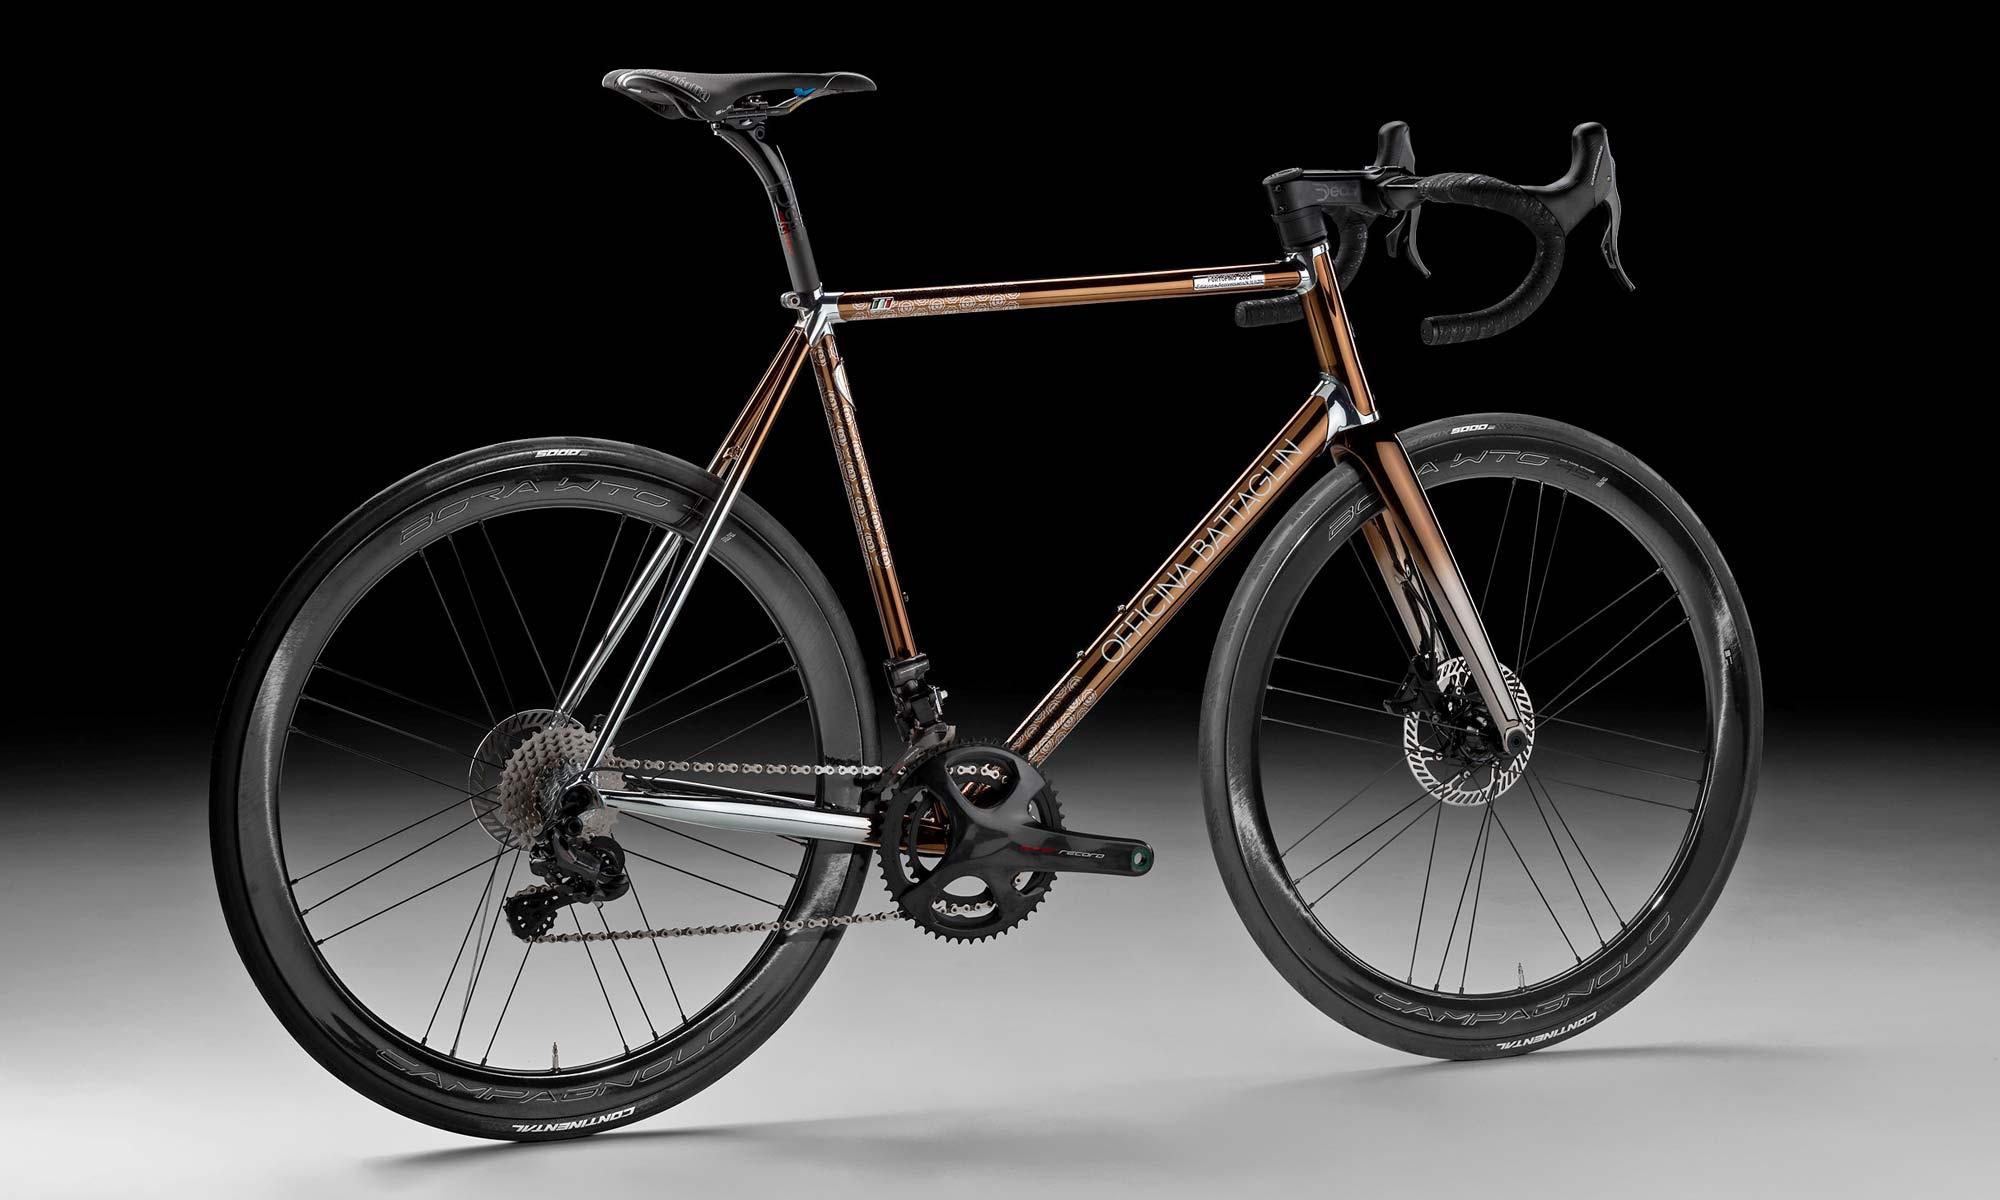 2021 Battaglin Portofino Edizione Anniversario road bike, handmade Italian modern lugged steel road bike with full internal routing,complete